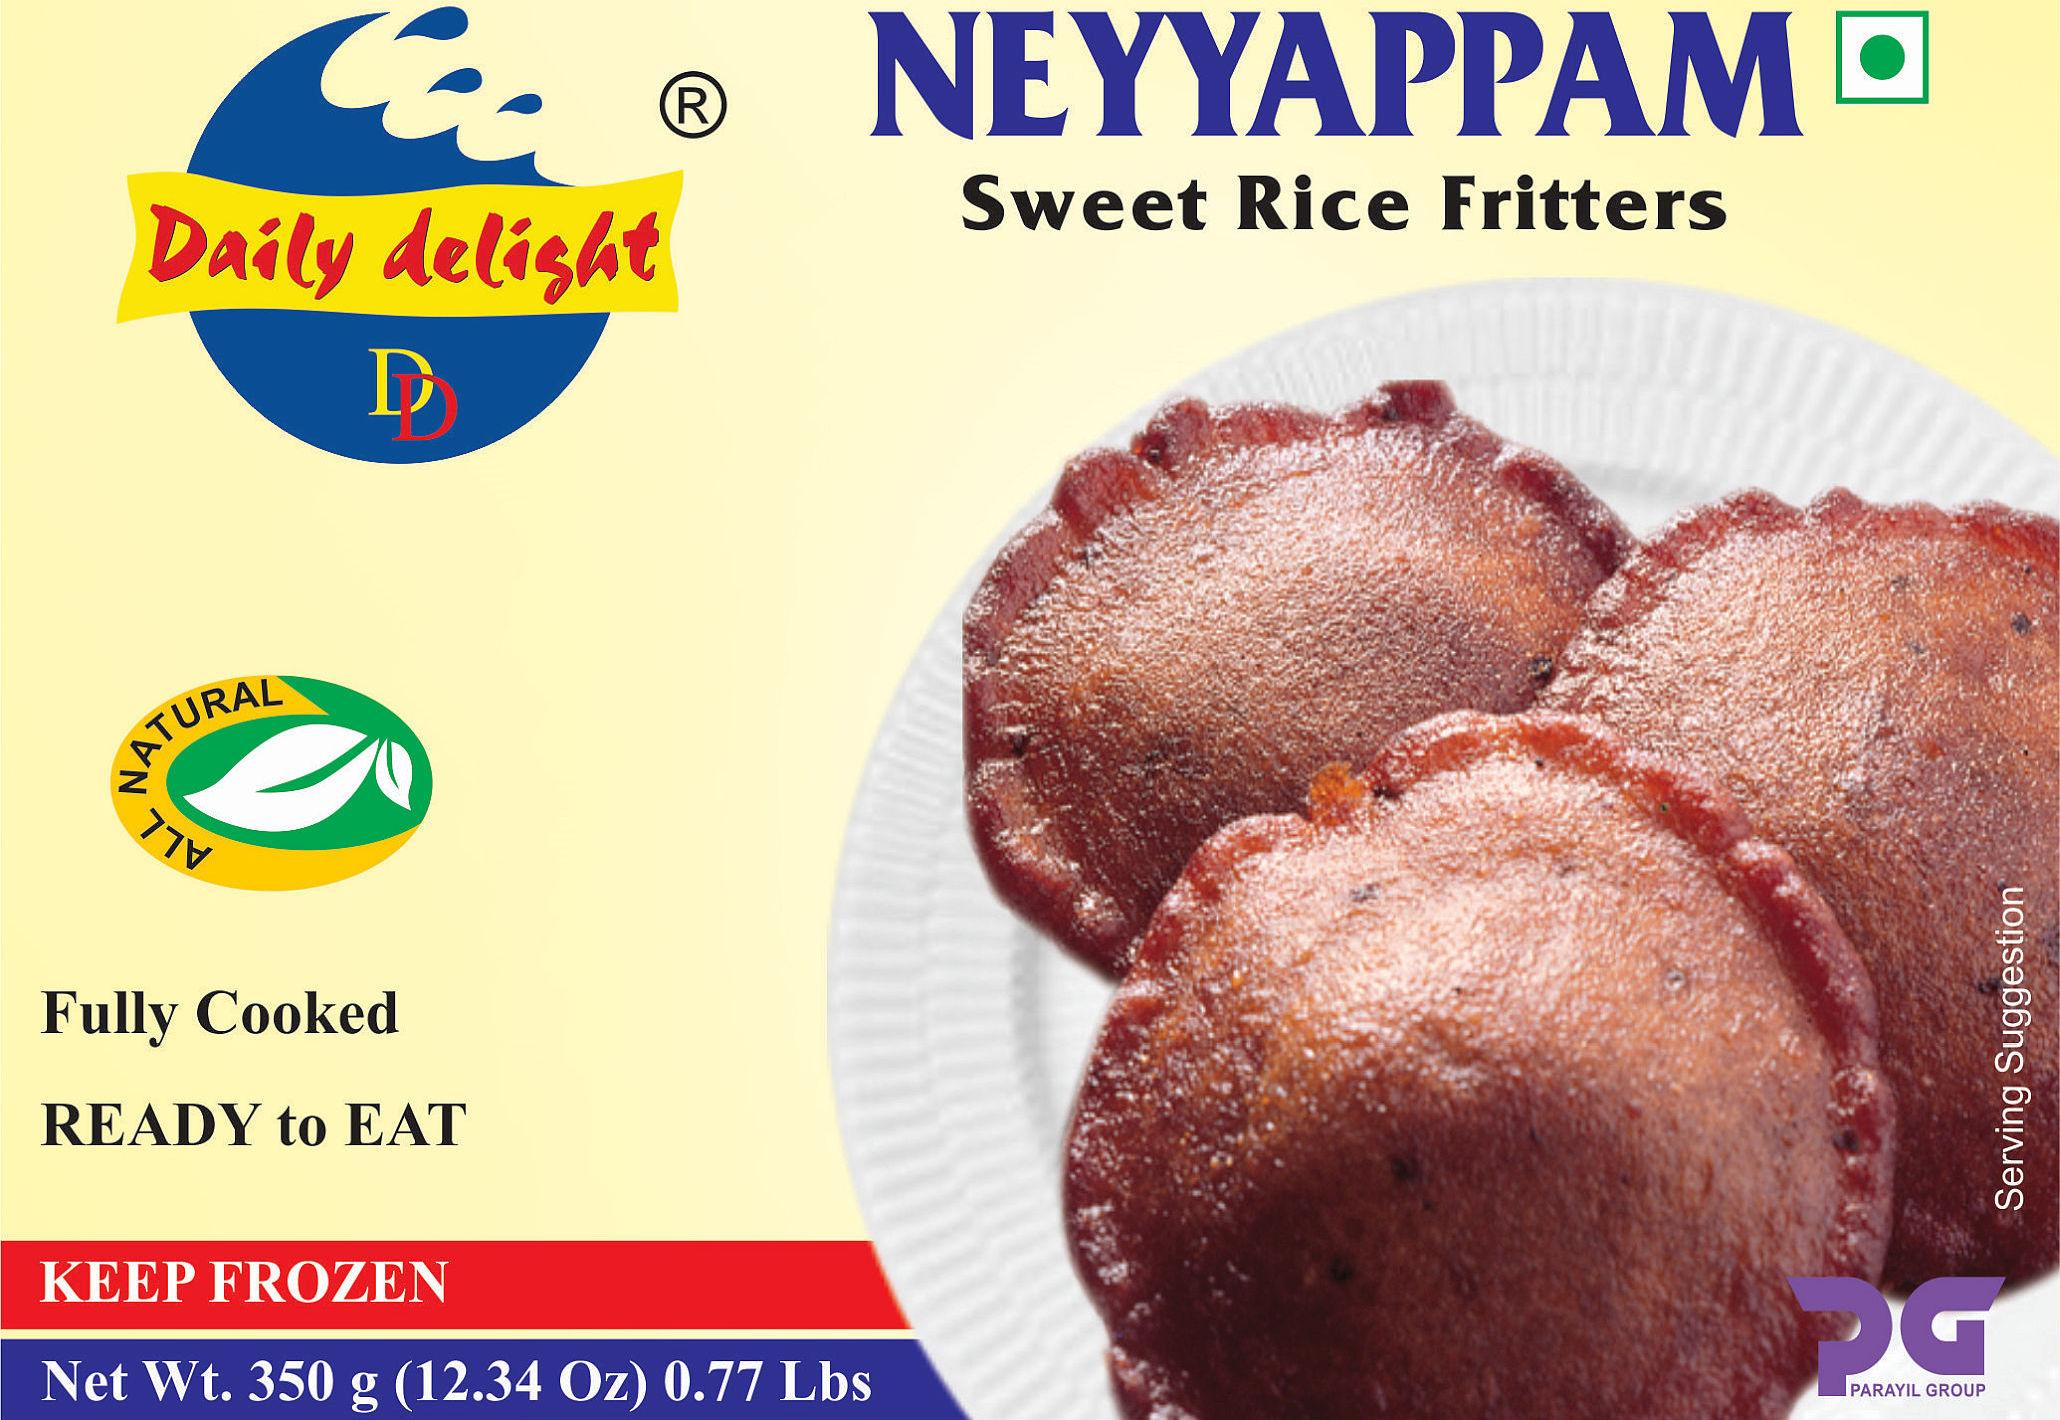 Daily Delight Neyyappam